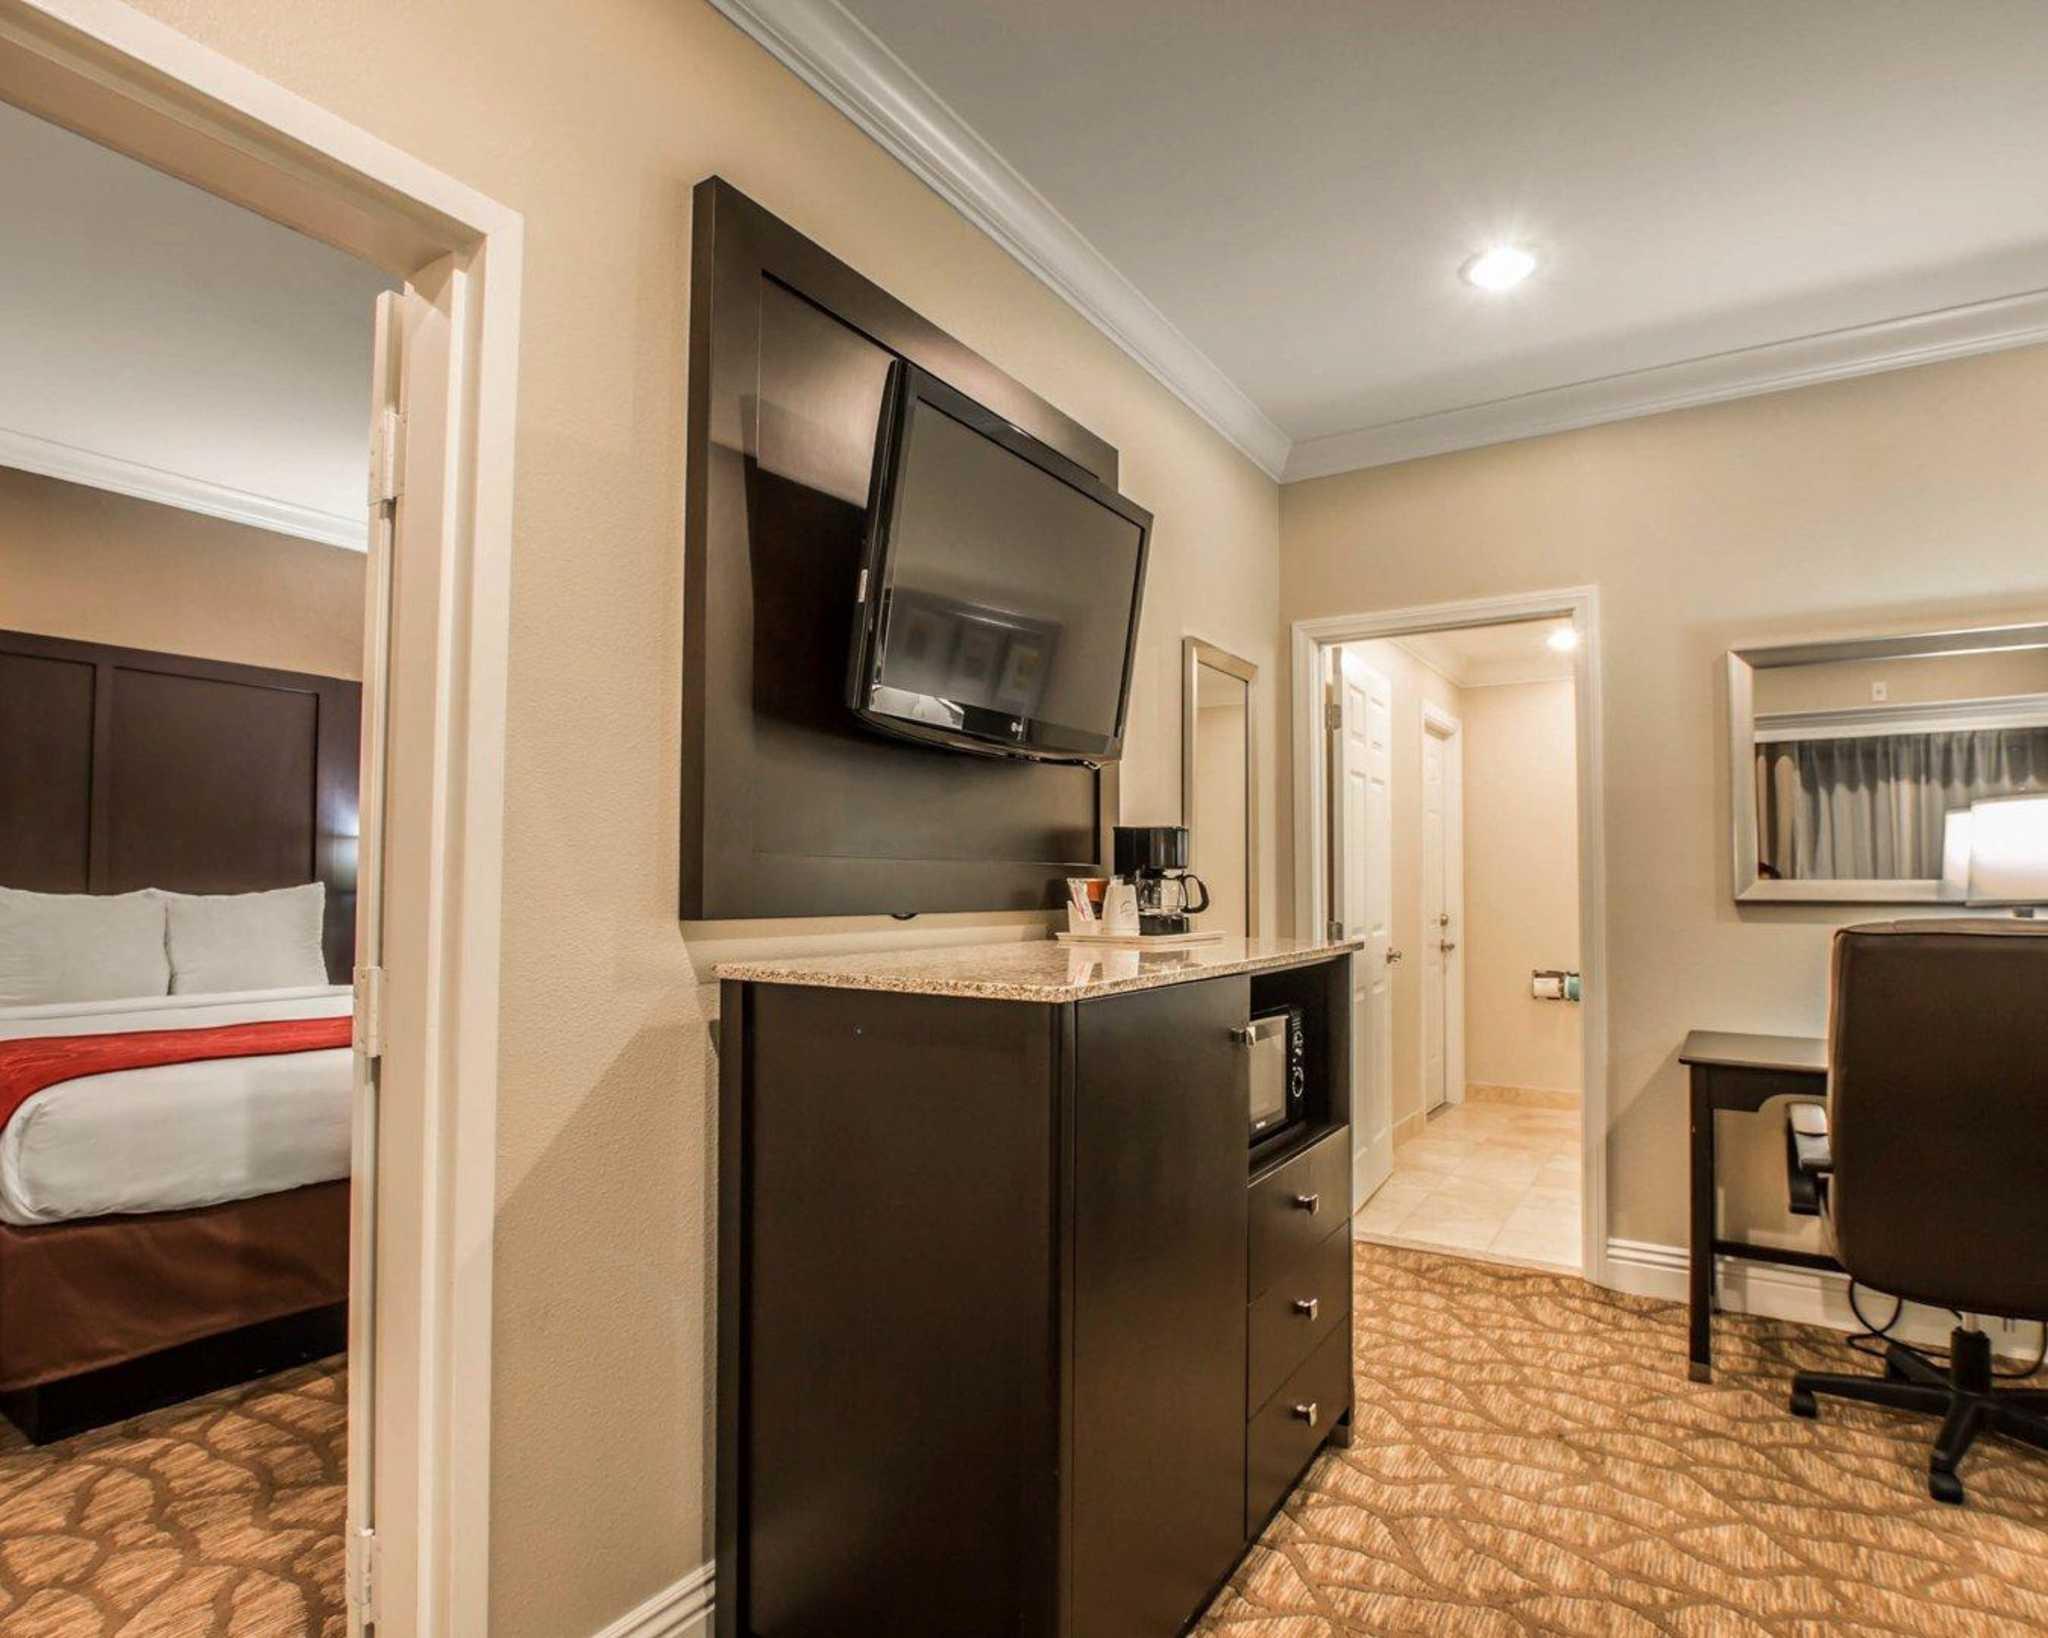 Comfort Suites Huntington Beach image 25